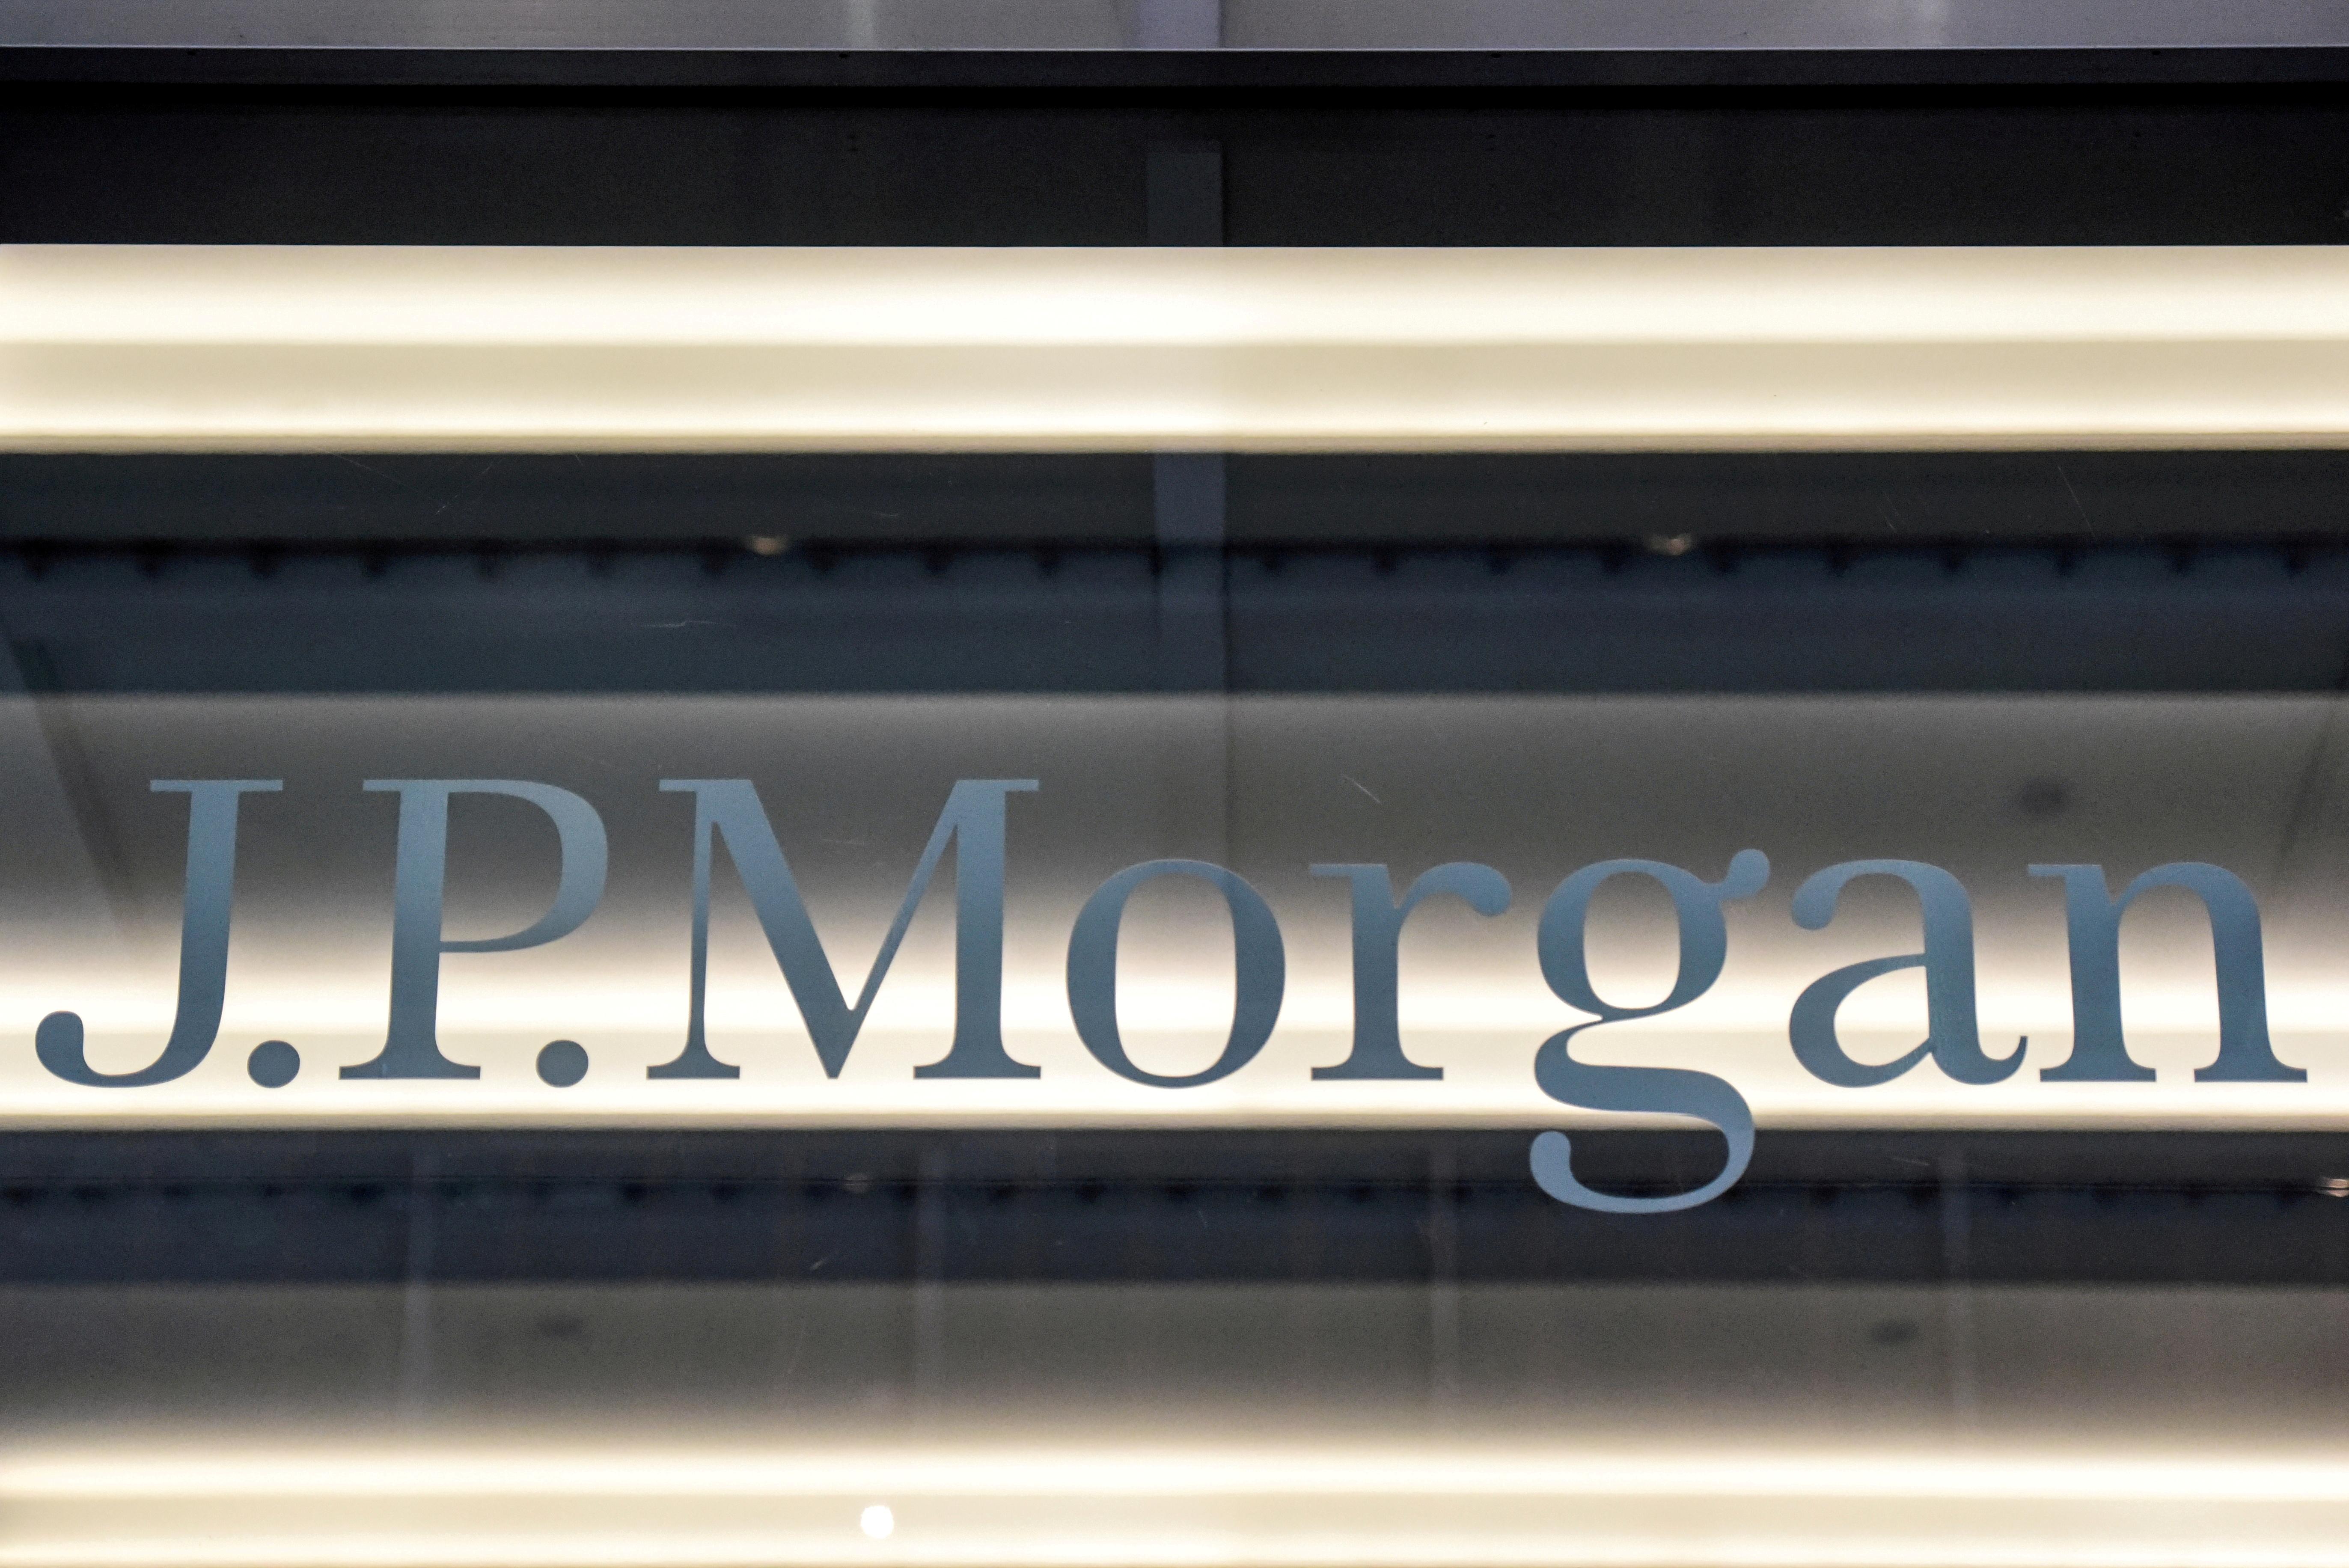 A JPMorgan logo is seen in New York City, U.S., January 10, 2017. REUTERS/Stephanie Keith